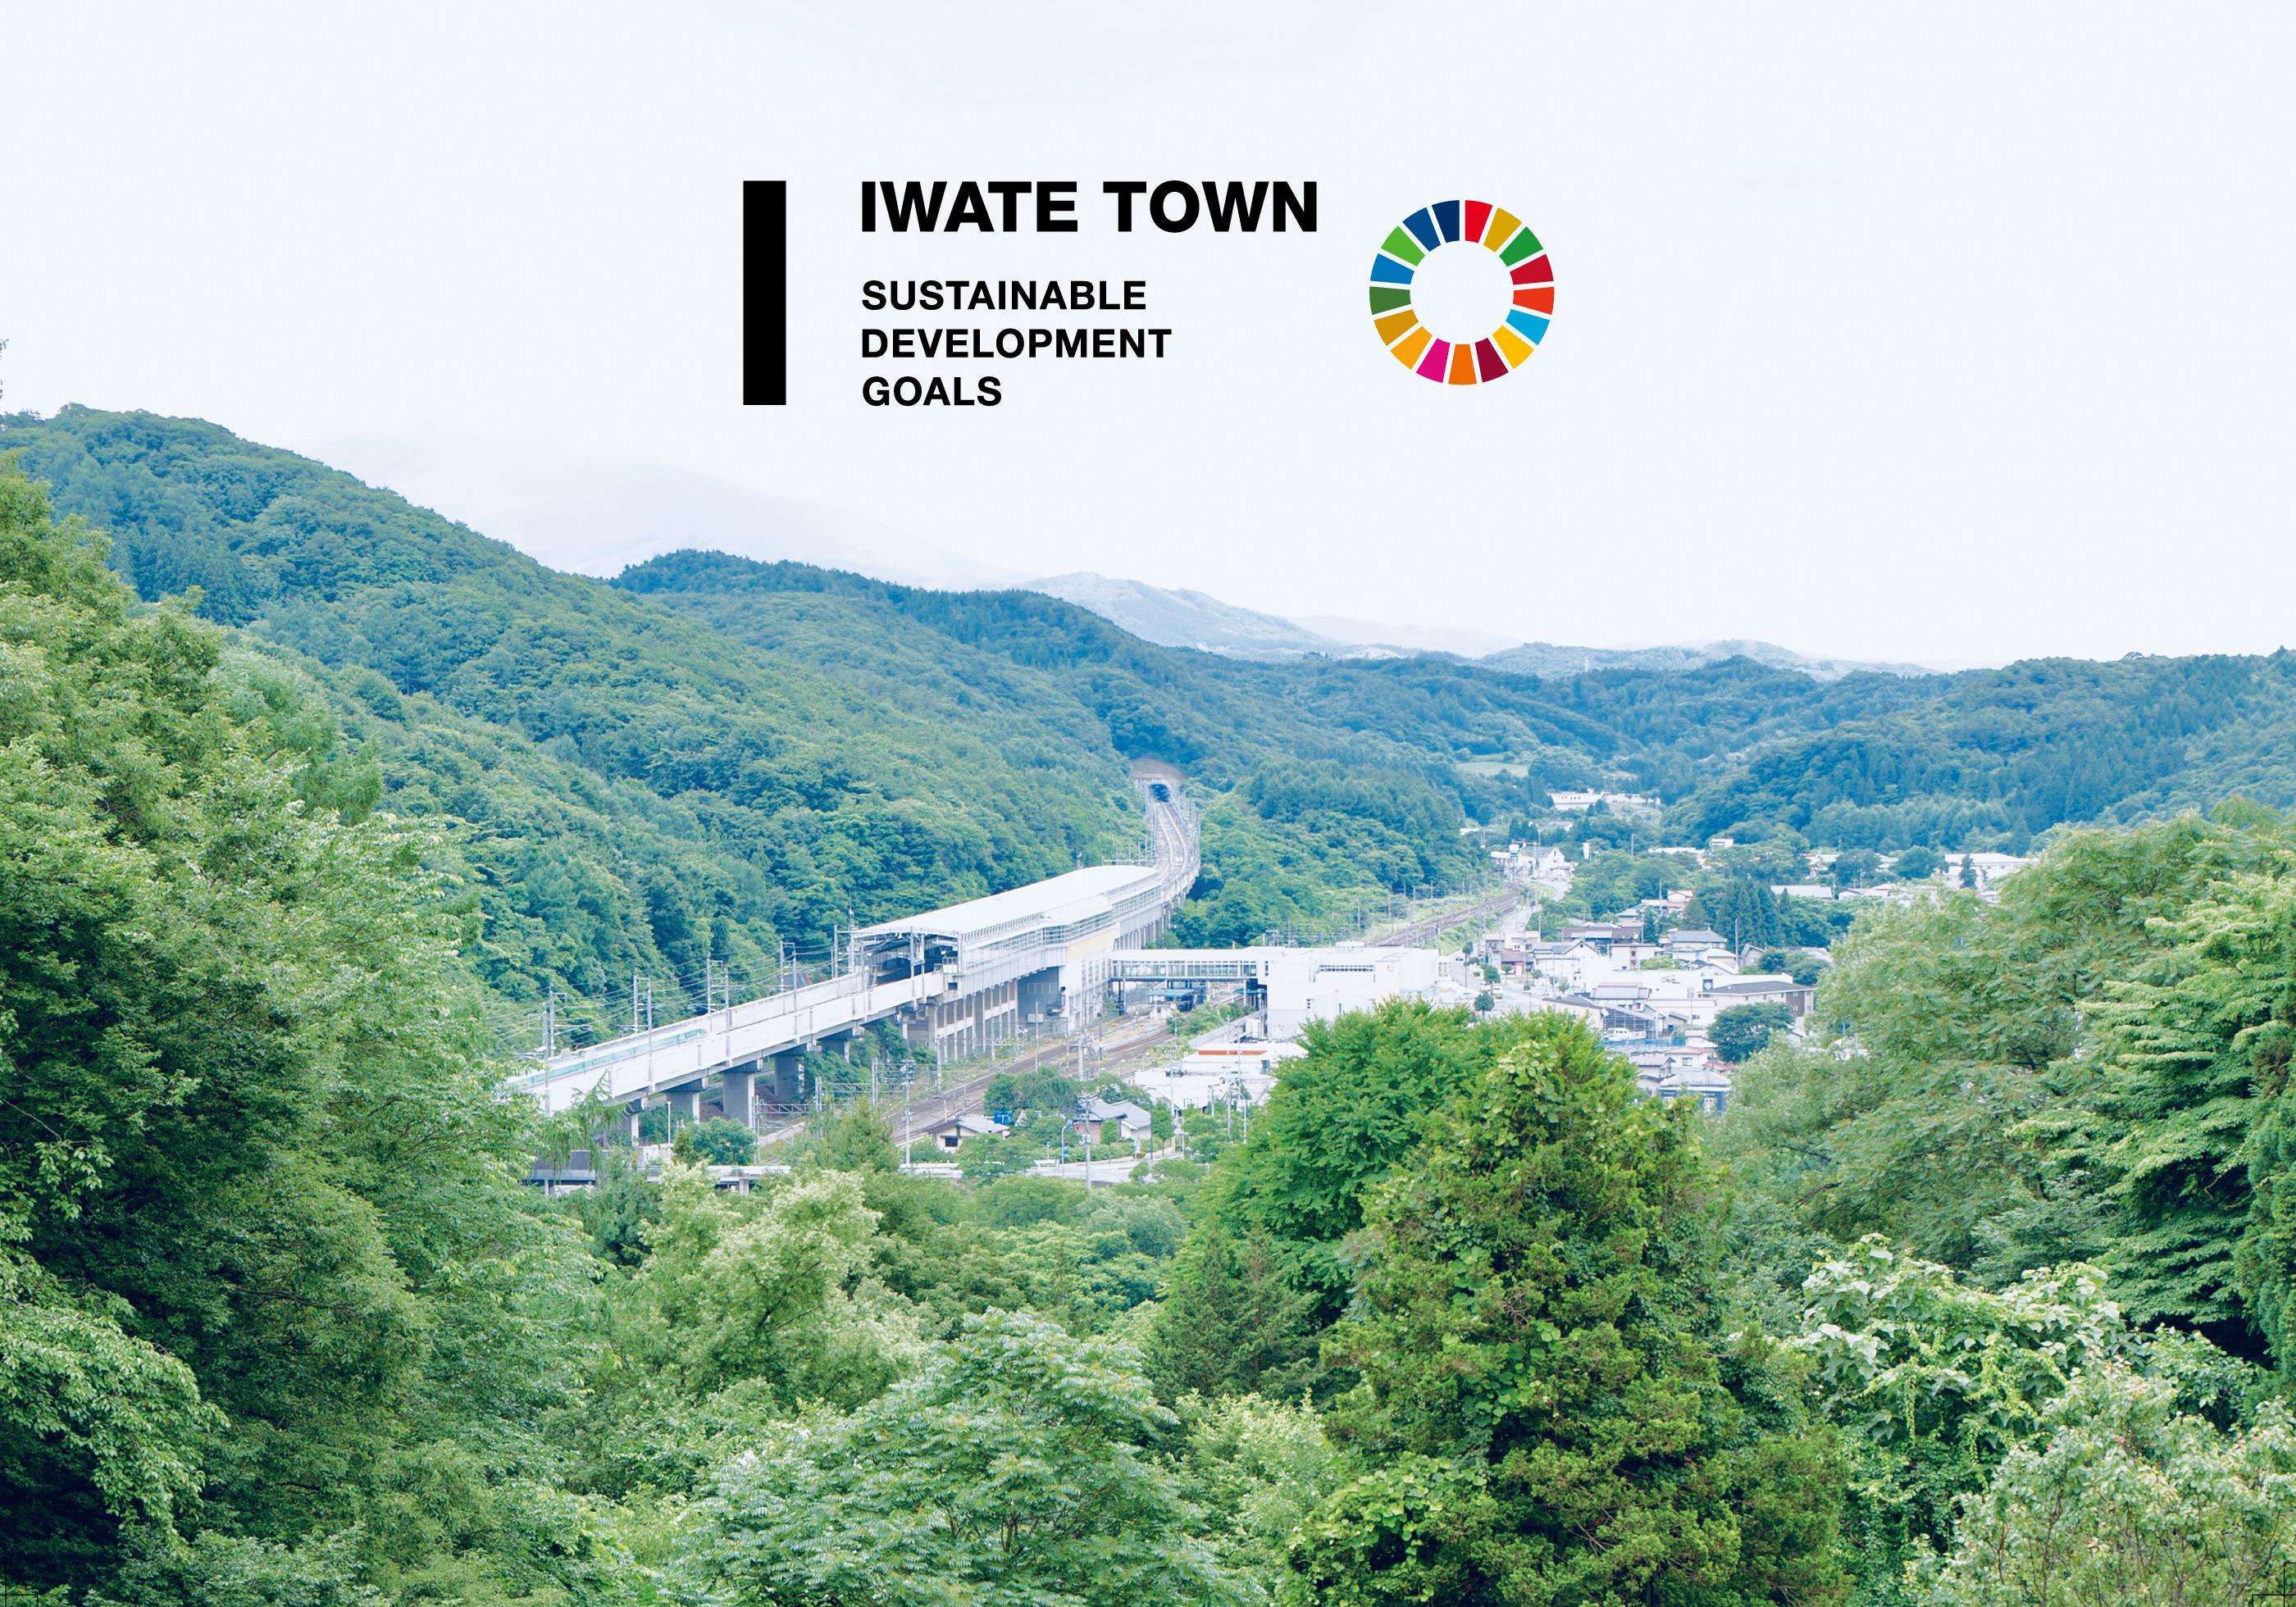 SDGs未来都市岩手町のまちづくりと食を紹介する 「岩手町 × 丸の内 SDGs Tour」開催!